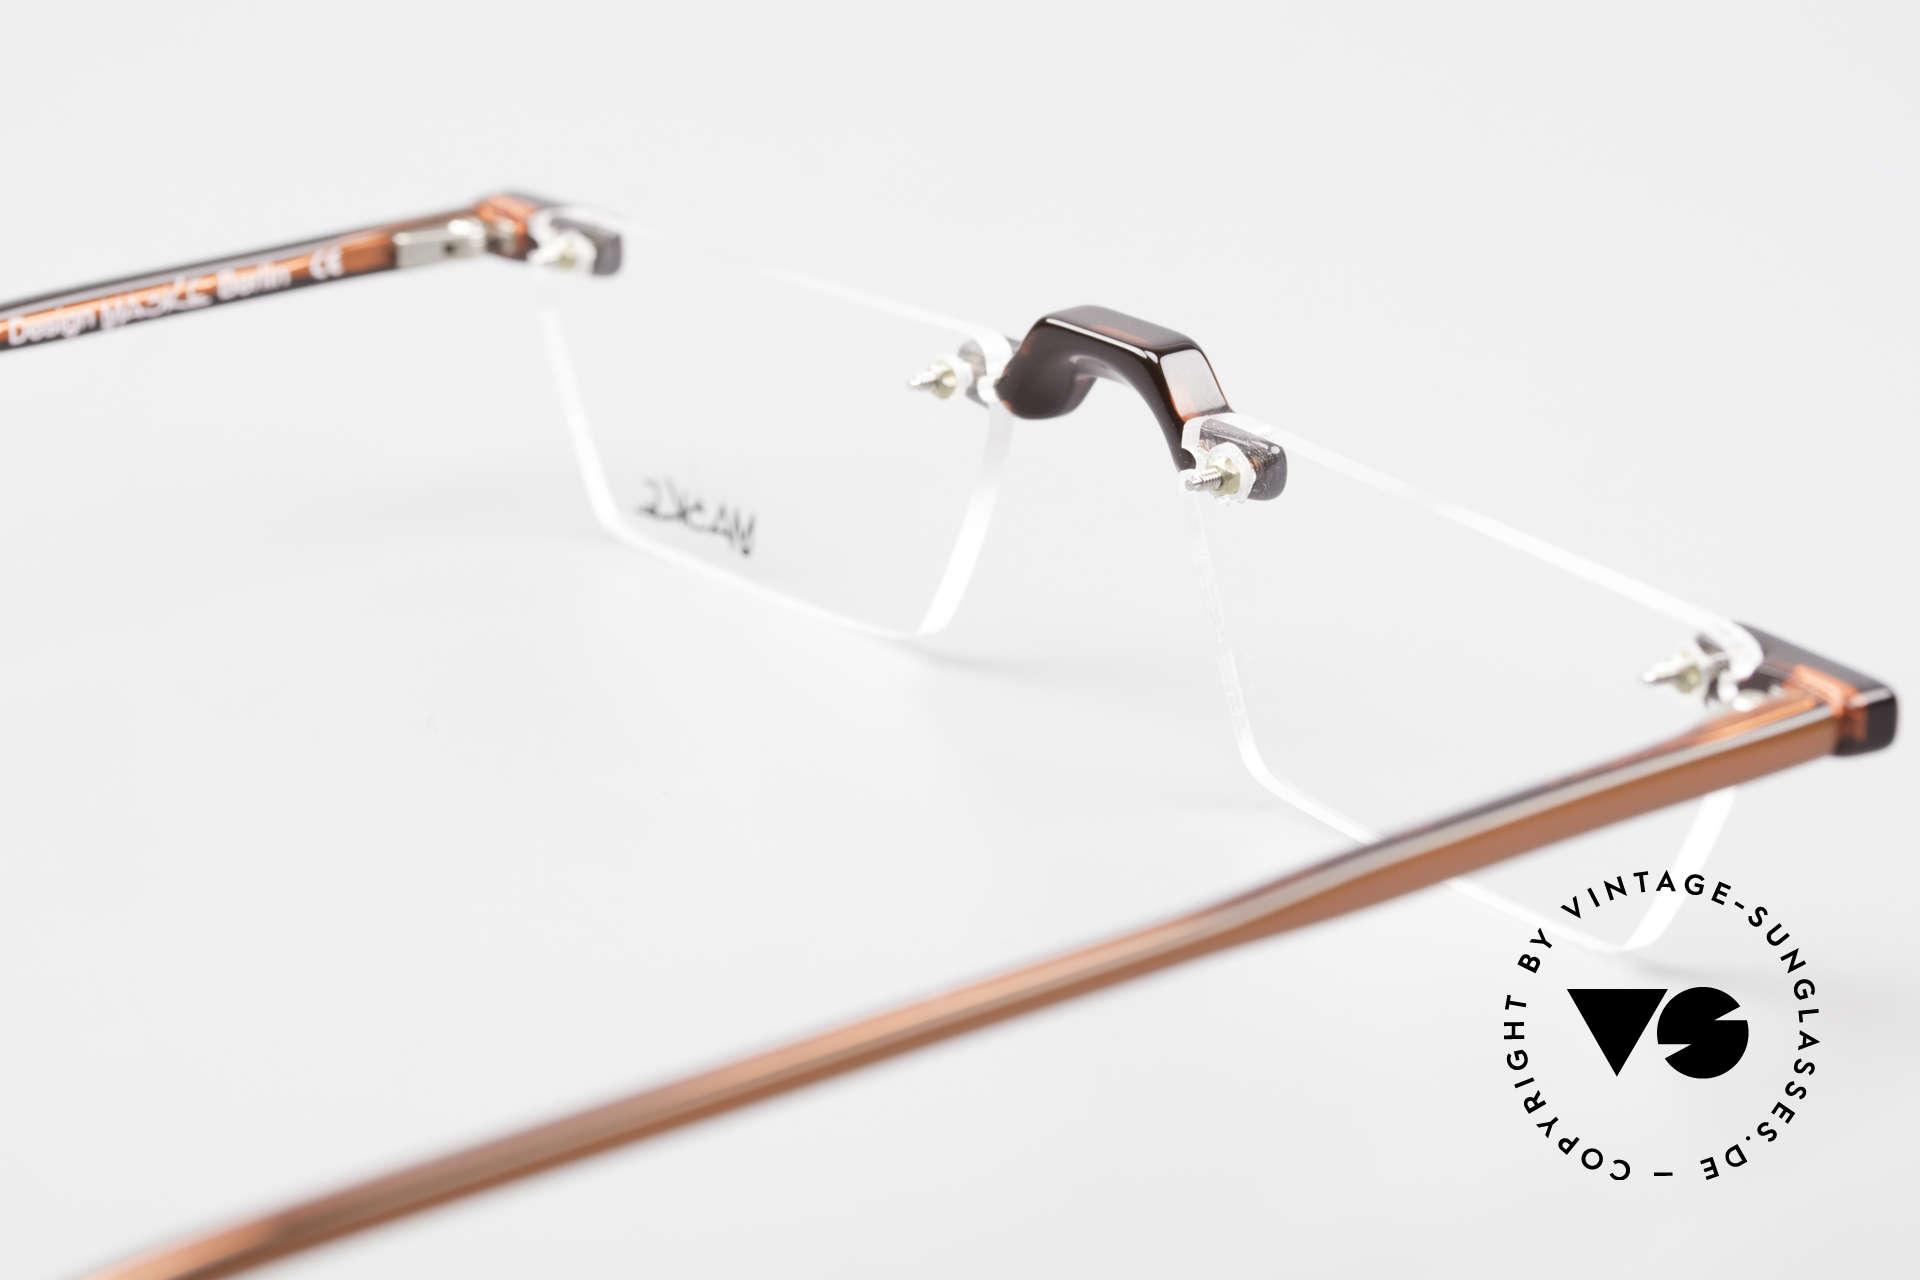 Design Maske Berlin Alpha 8 90's Designer Reading Glasses, Size: small, Made for Men and Women